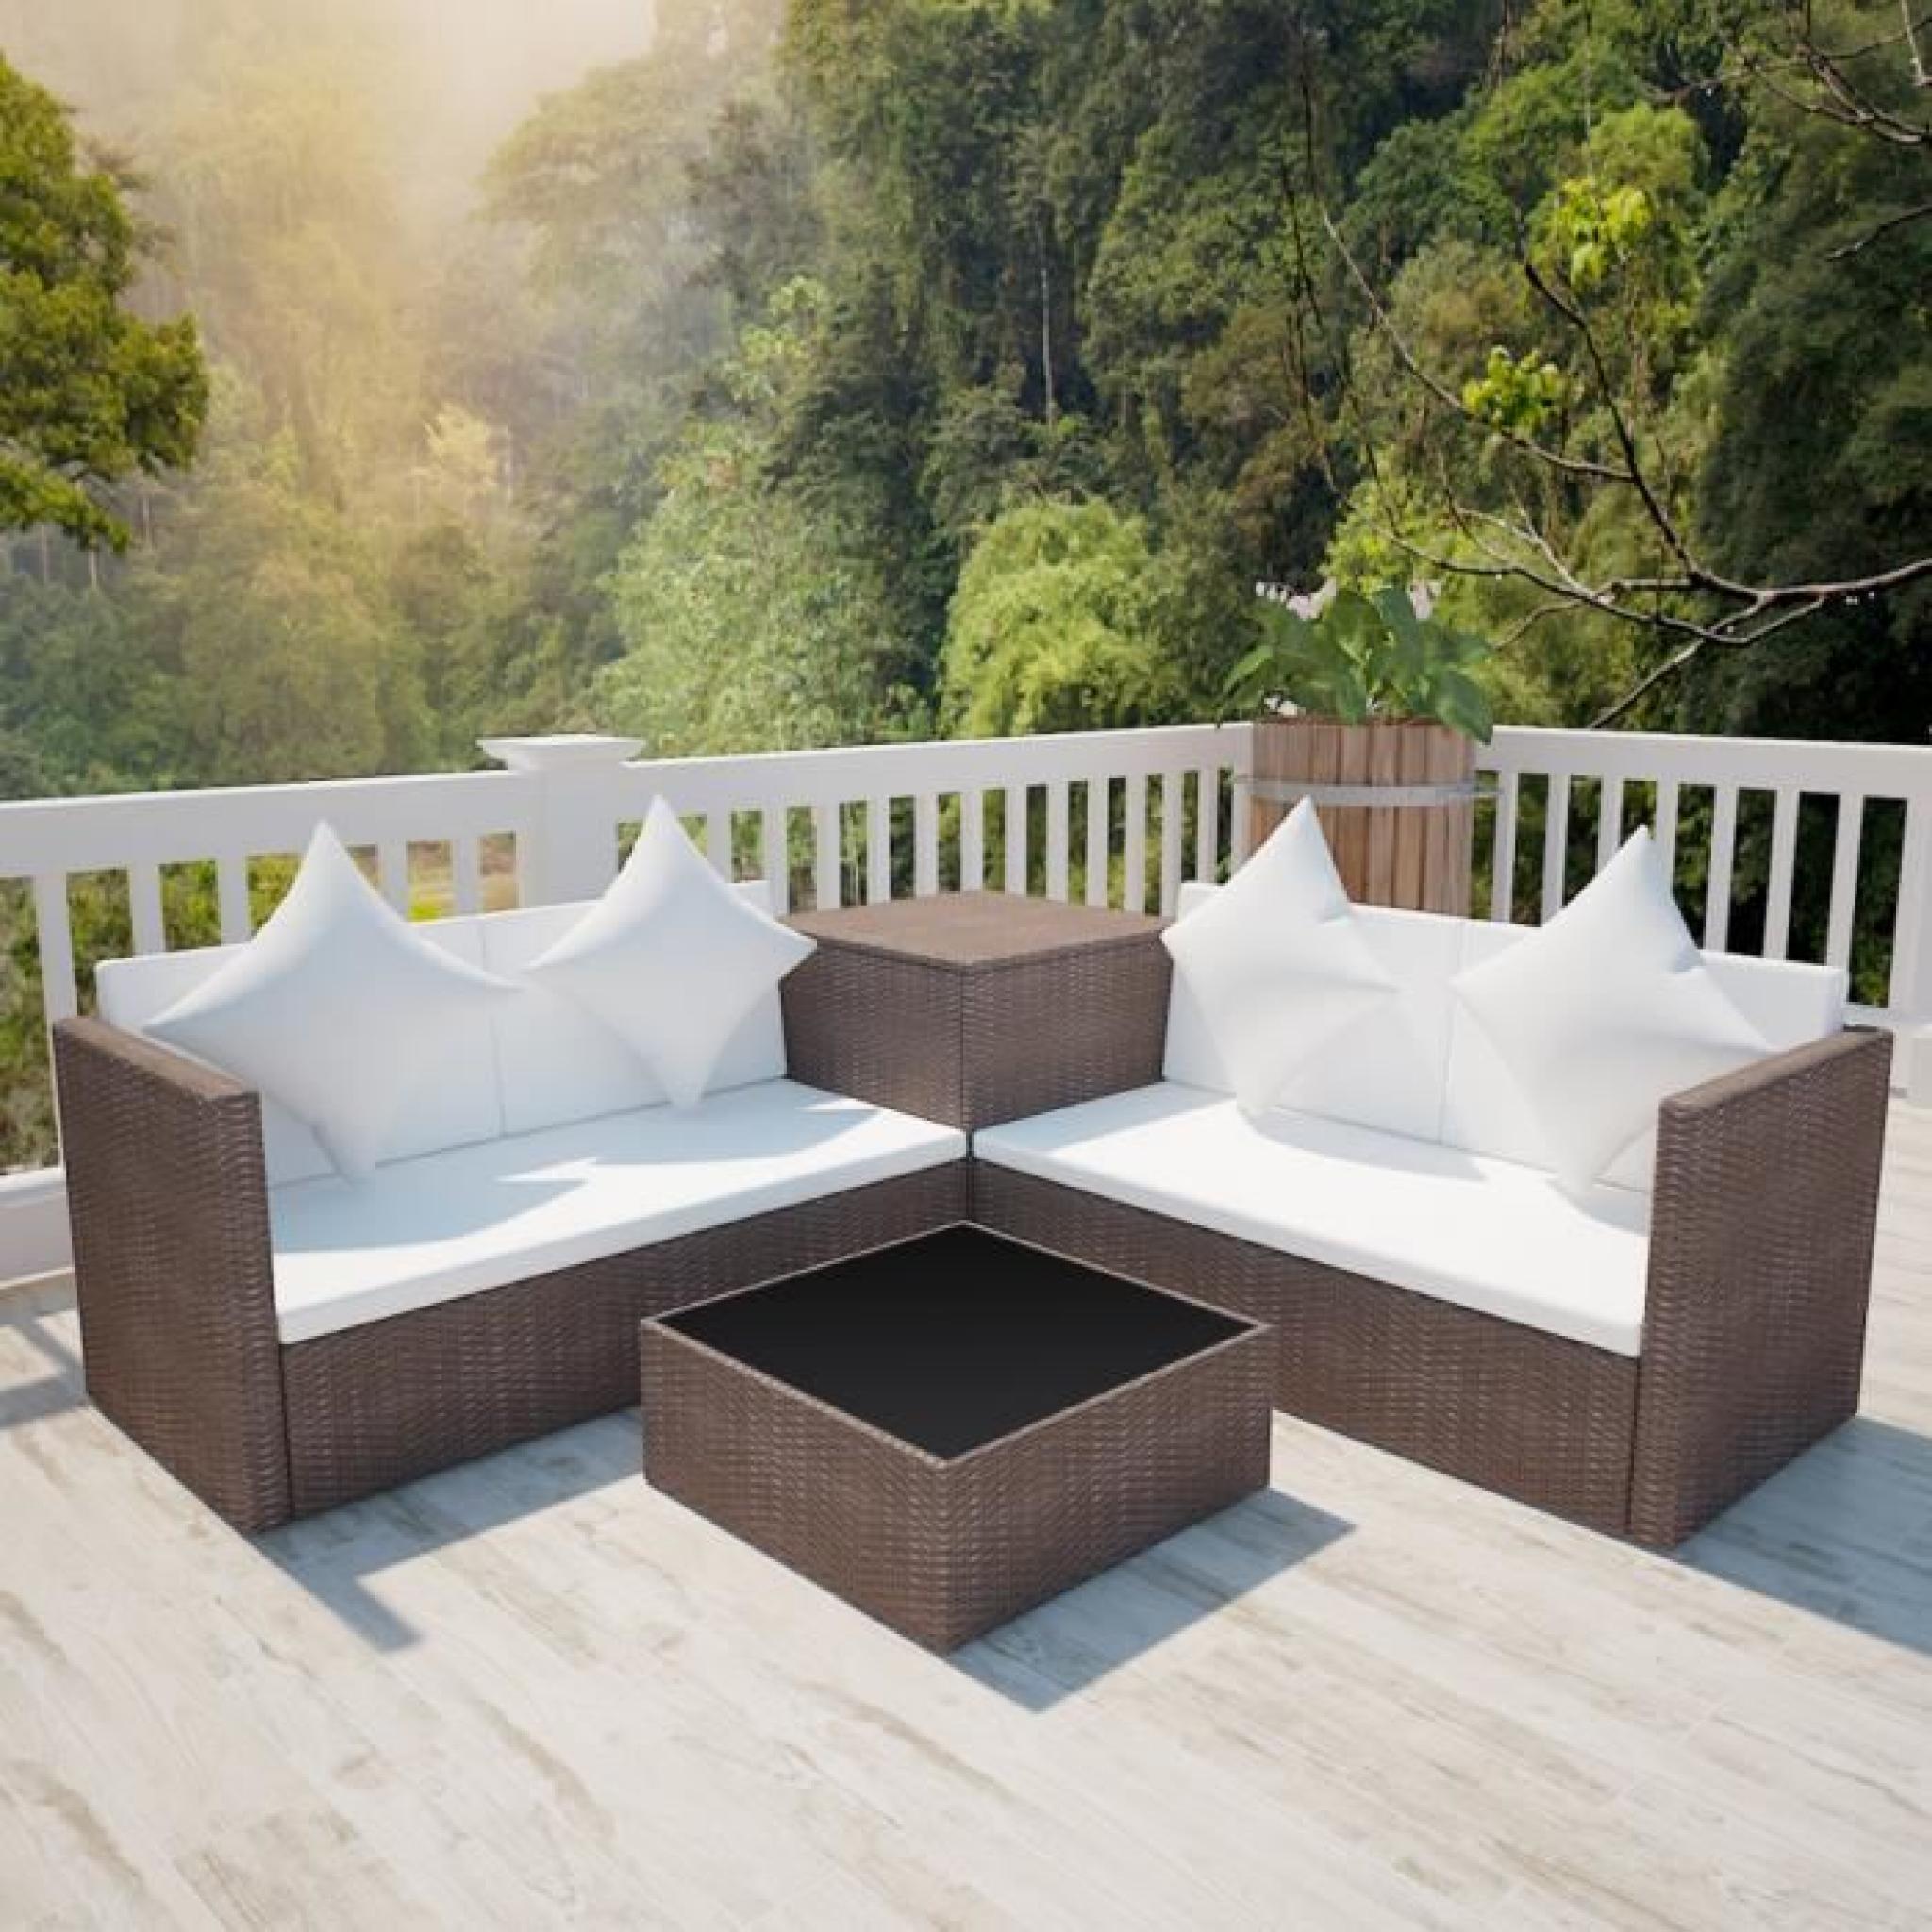 Salon de jardin en polyrotin marron avec coffre de rangement - Achat ...